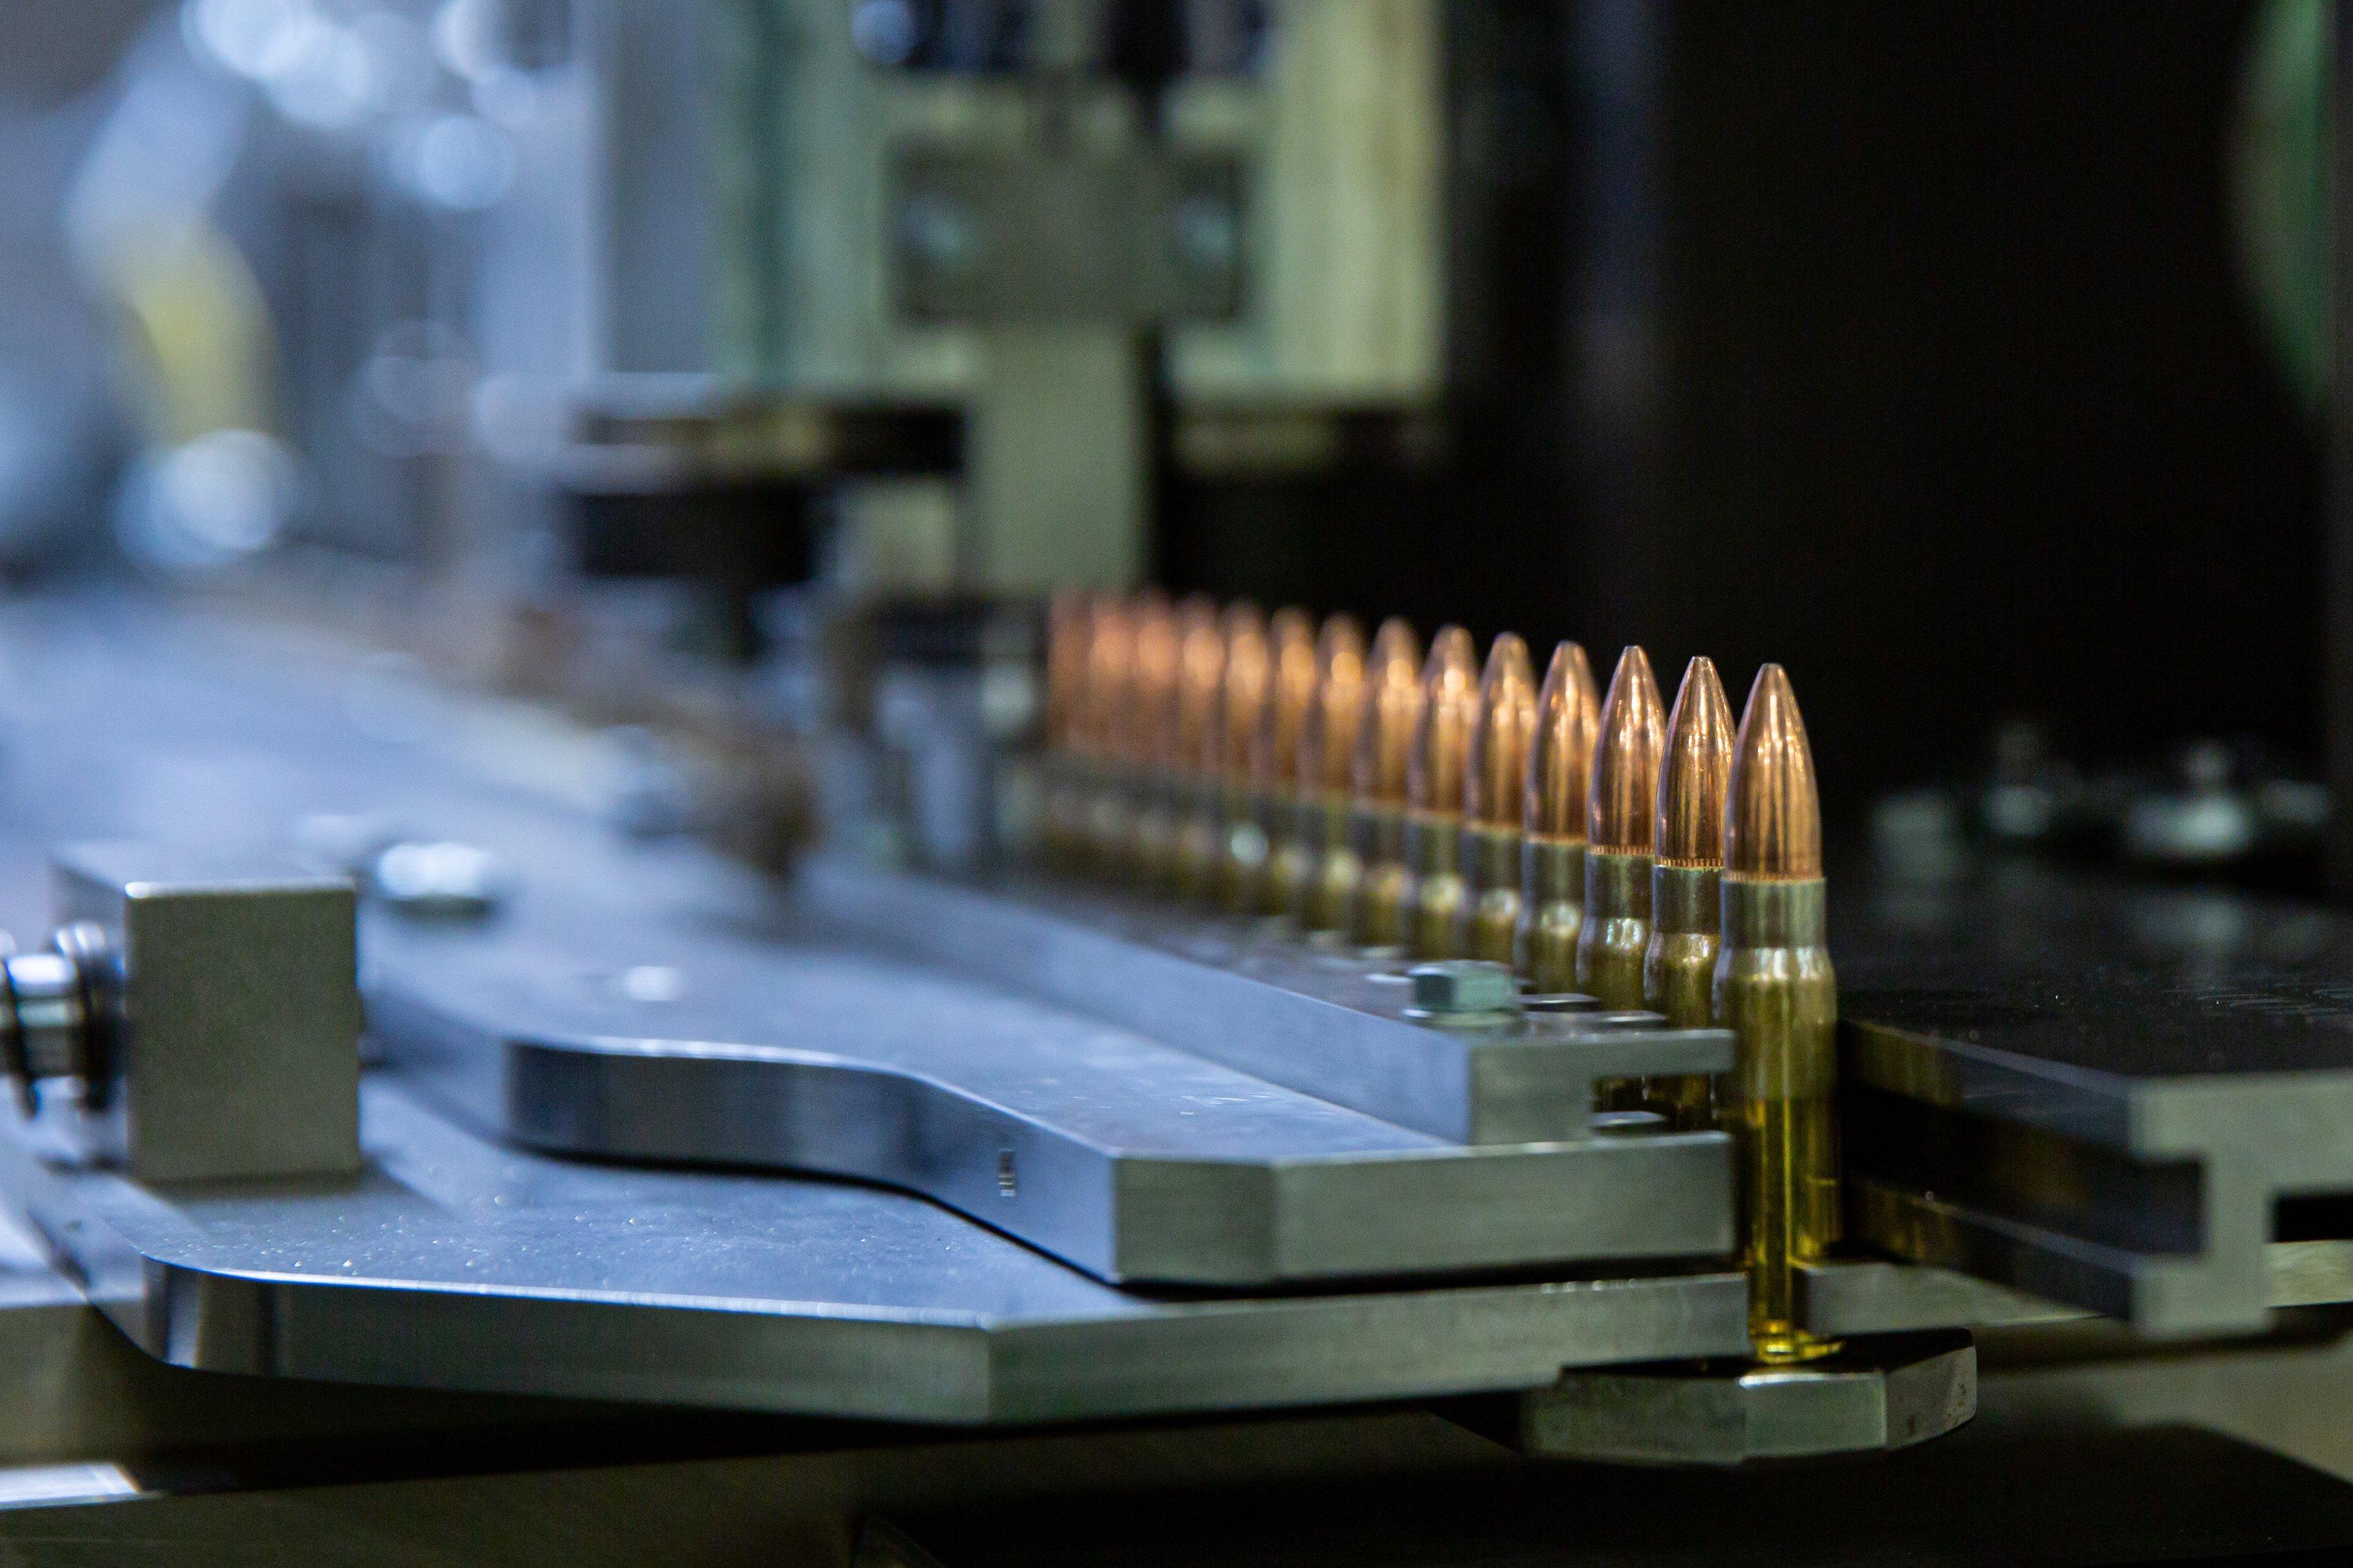 bullet manufacturing